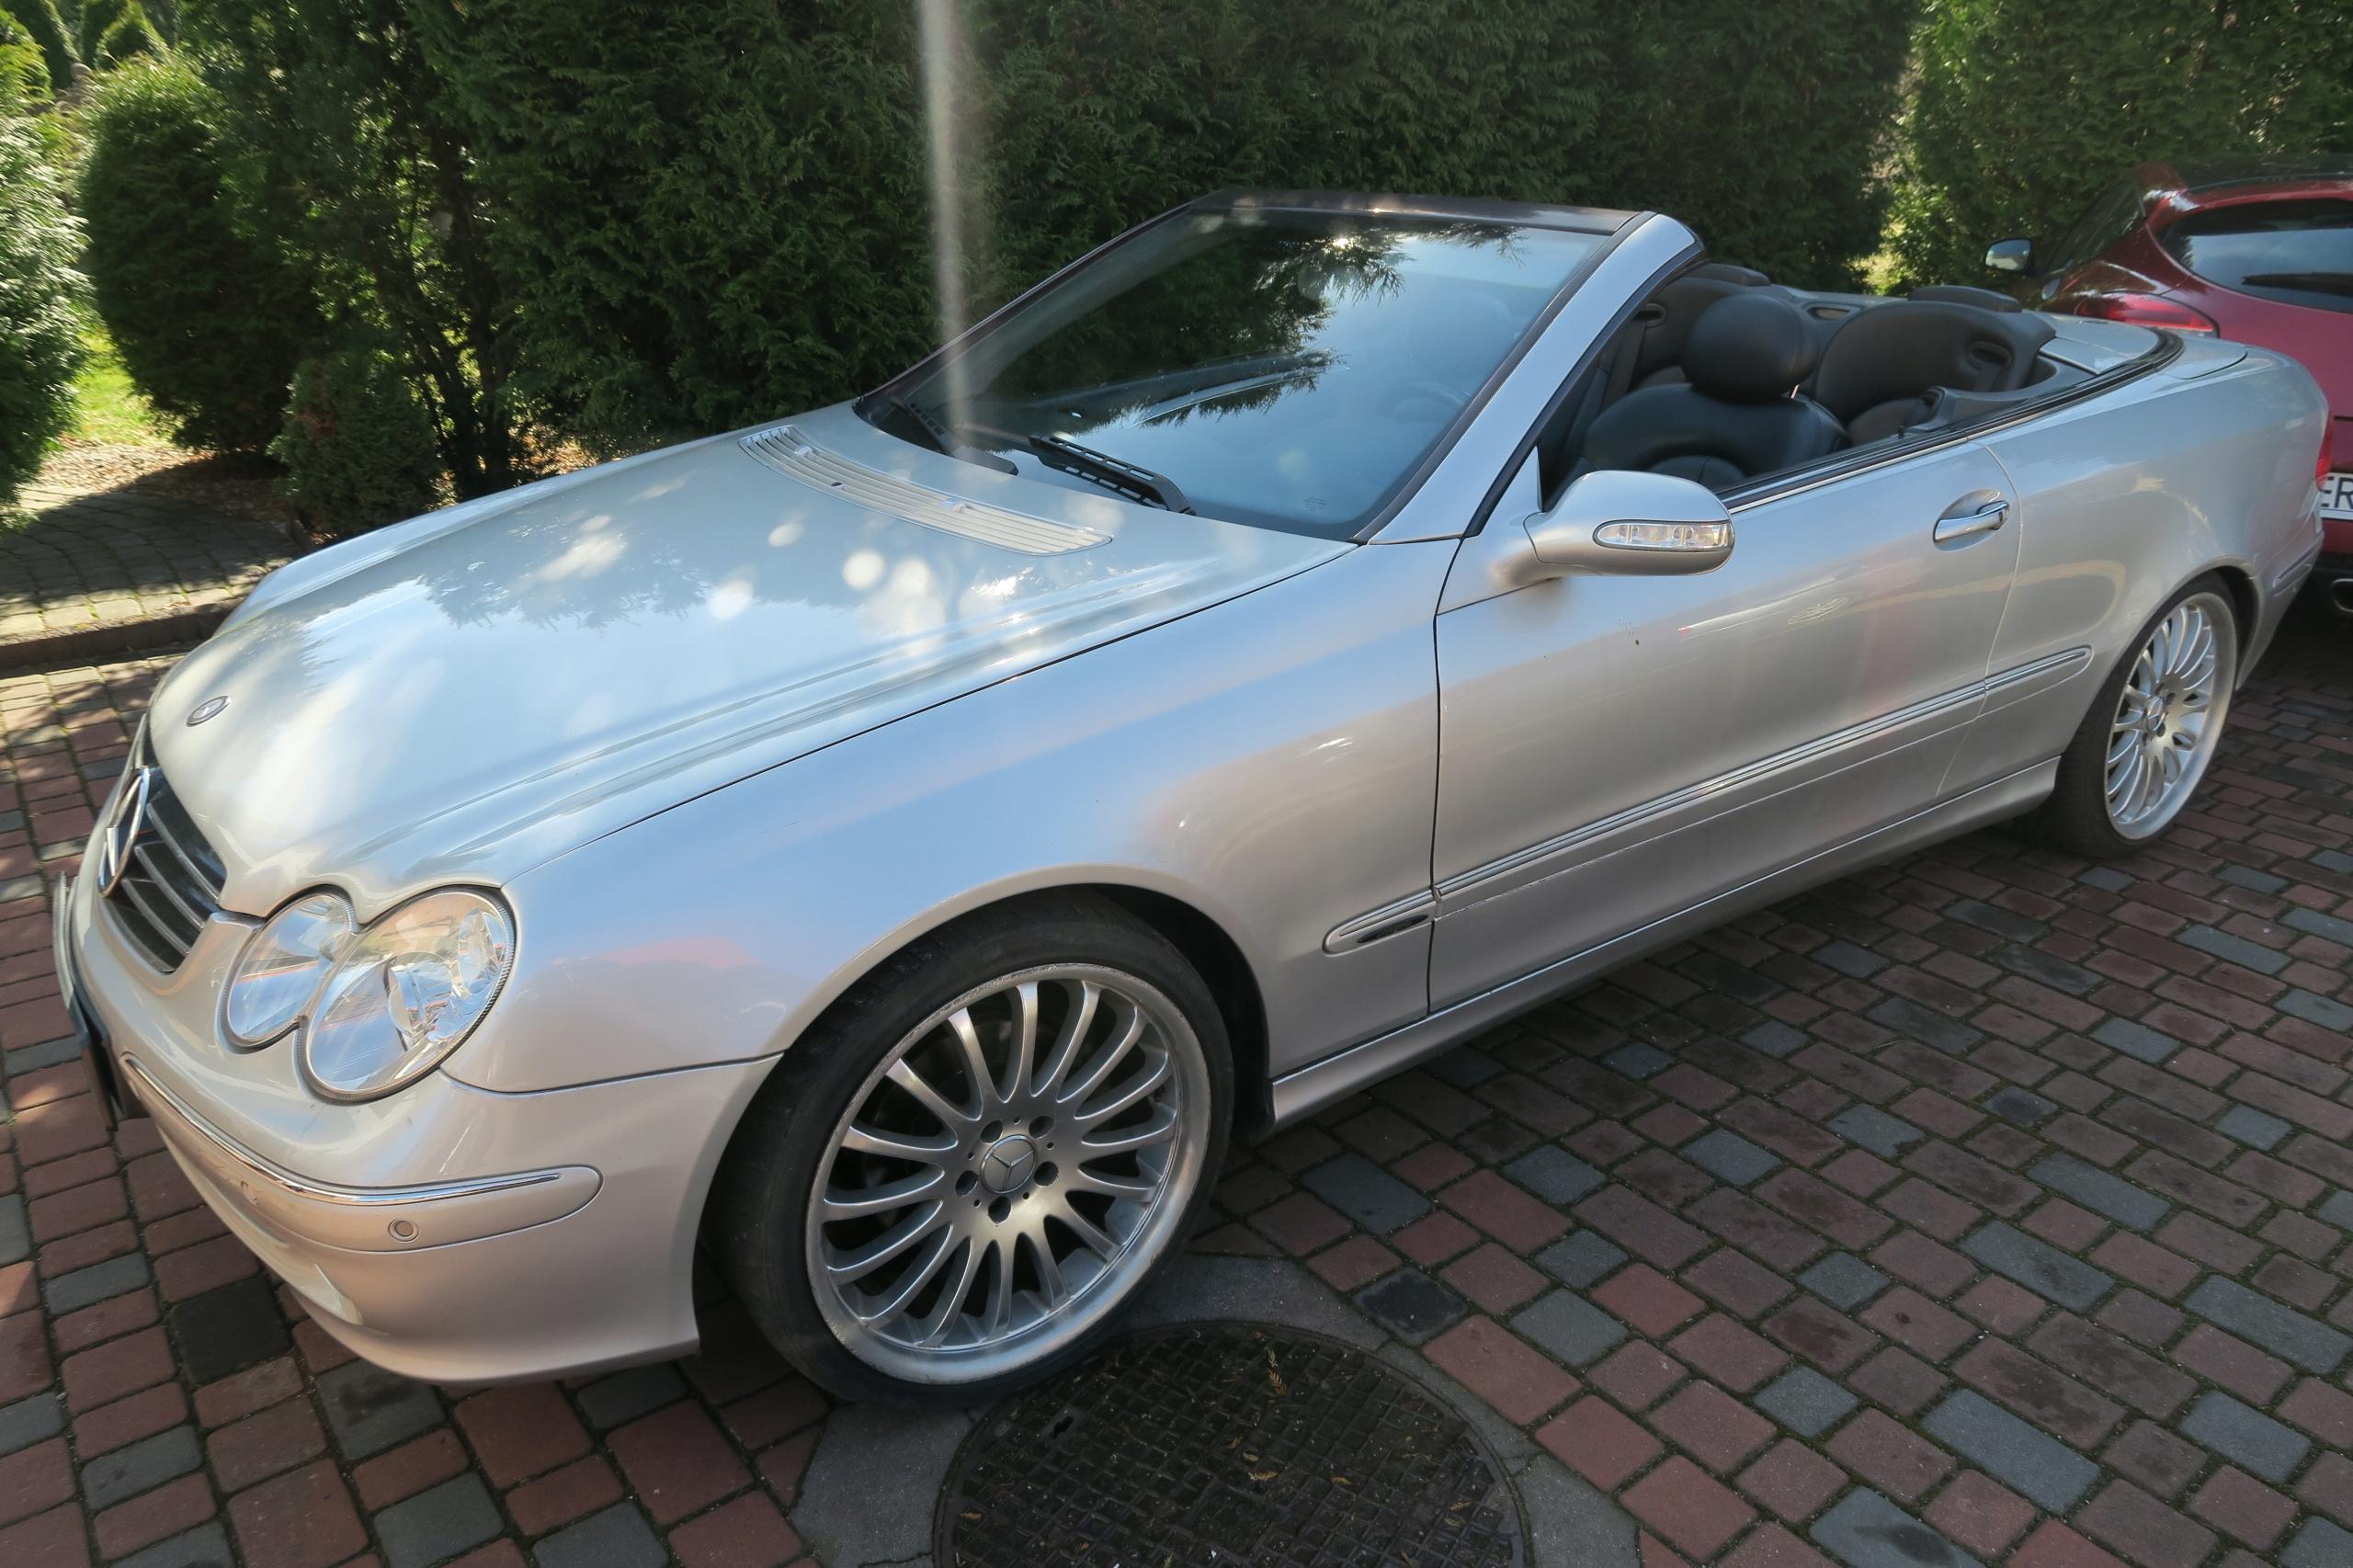 Mercedes clk 3.2 Avangarde